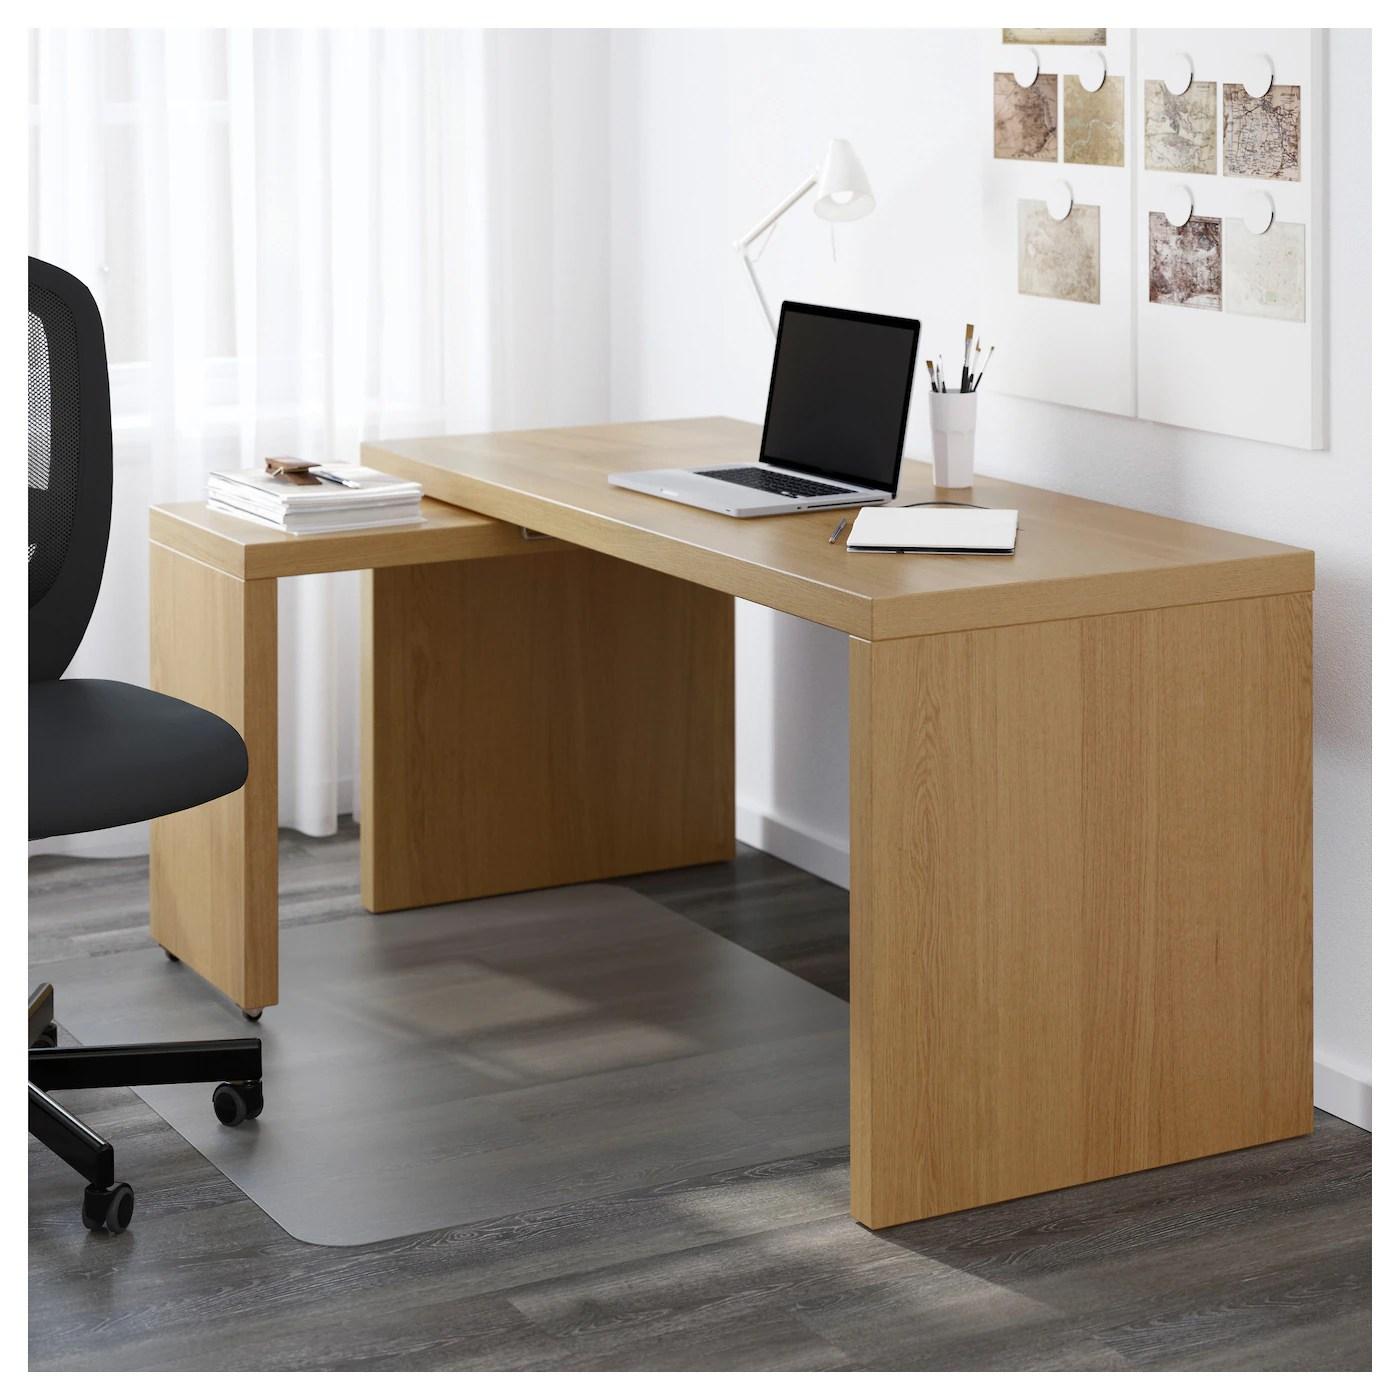 MALM Desk with pullout panel Oak veneer 151 x 65 cm  IKEA